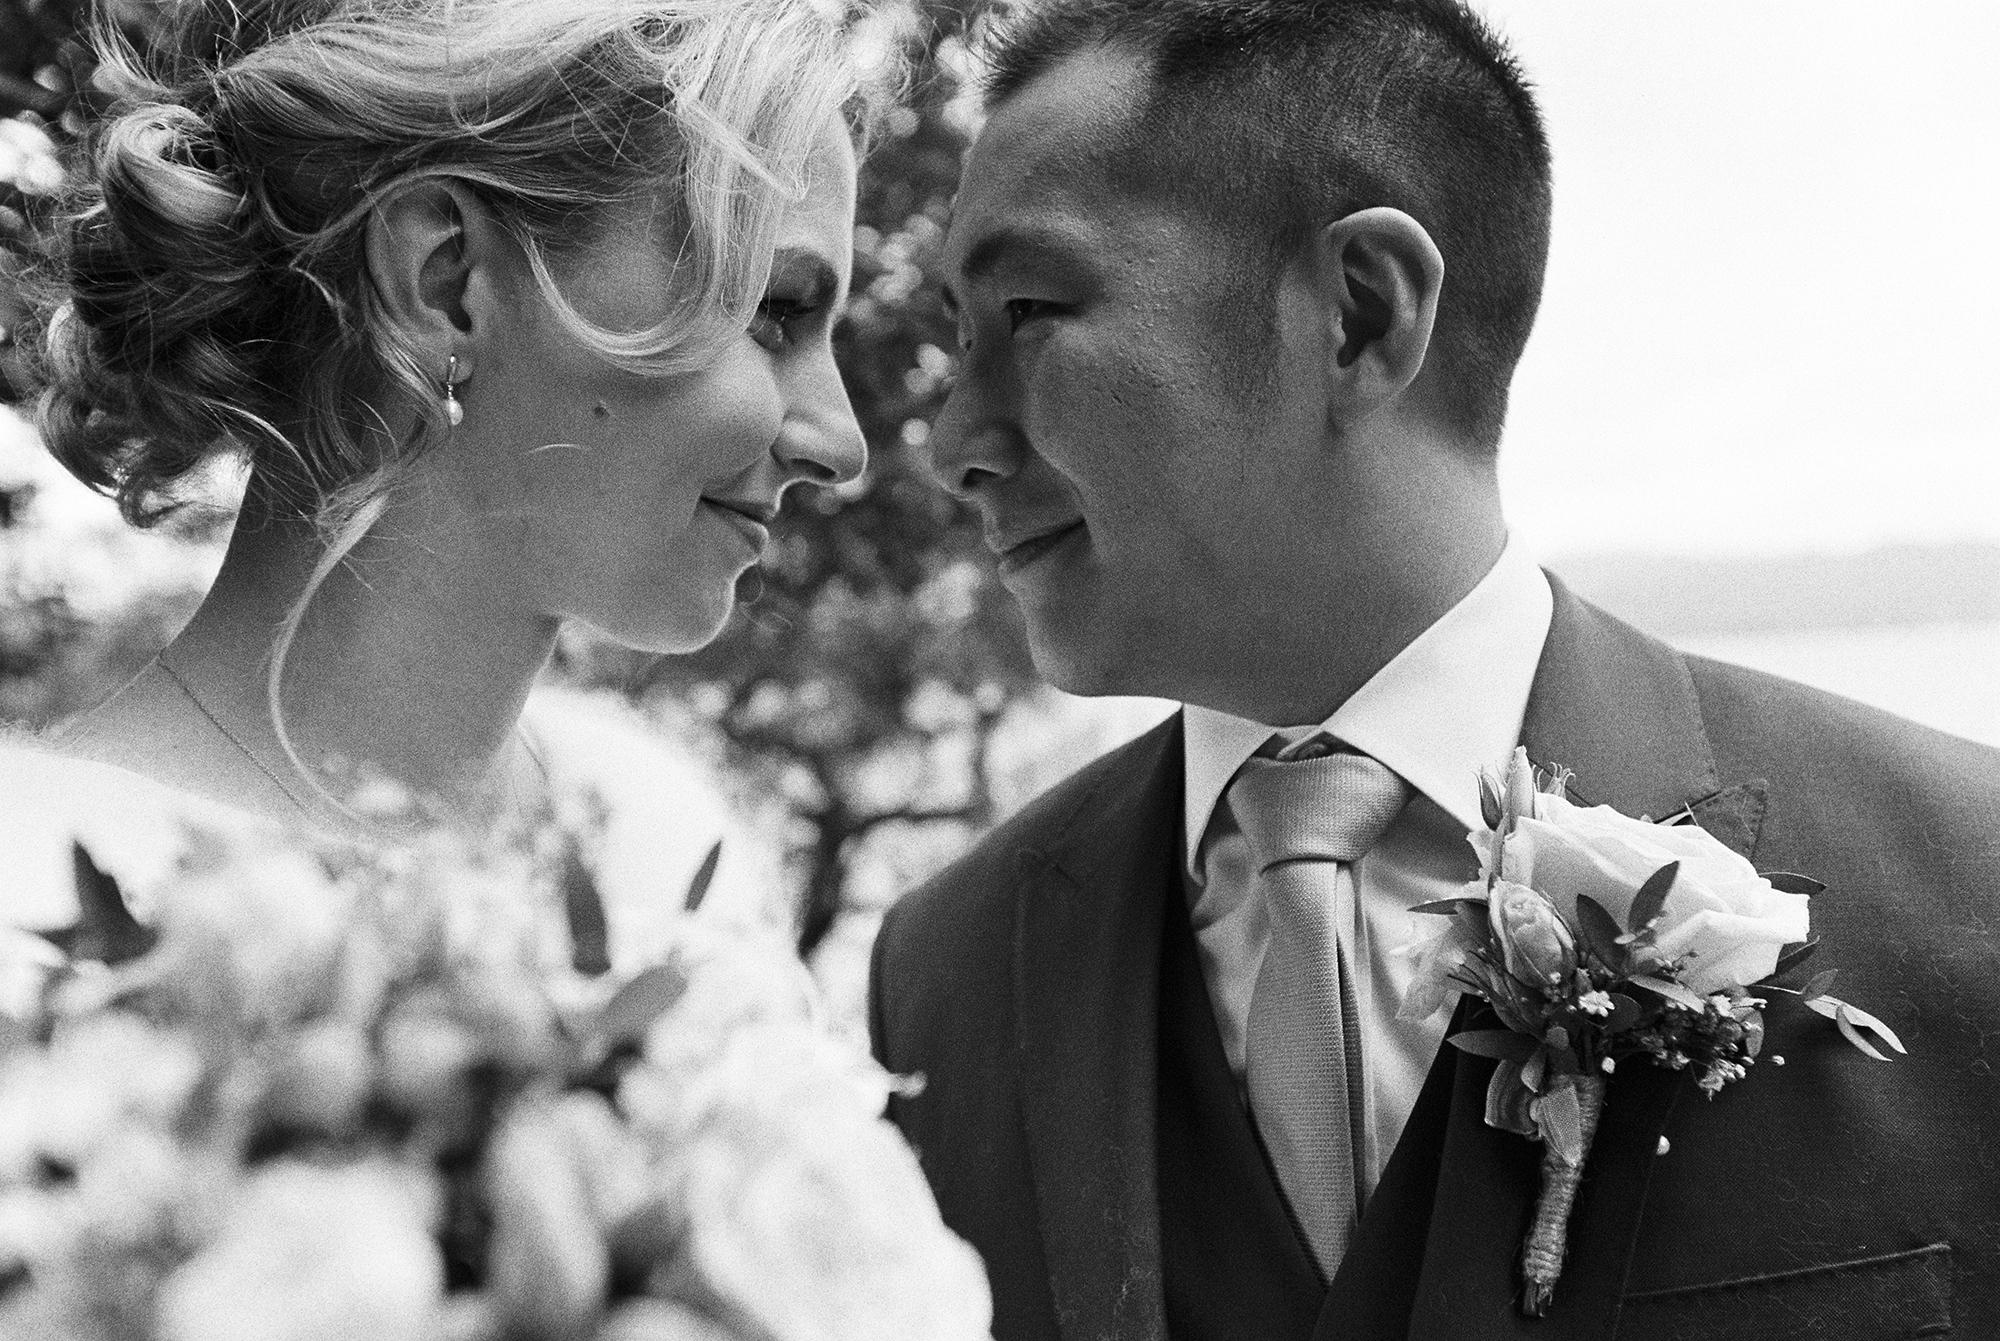 wedding_photographer_cumbria039.jpg